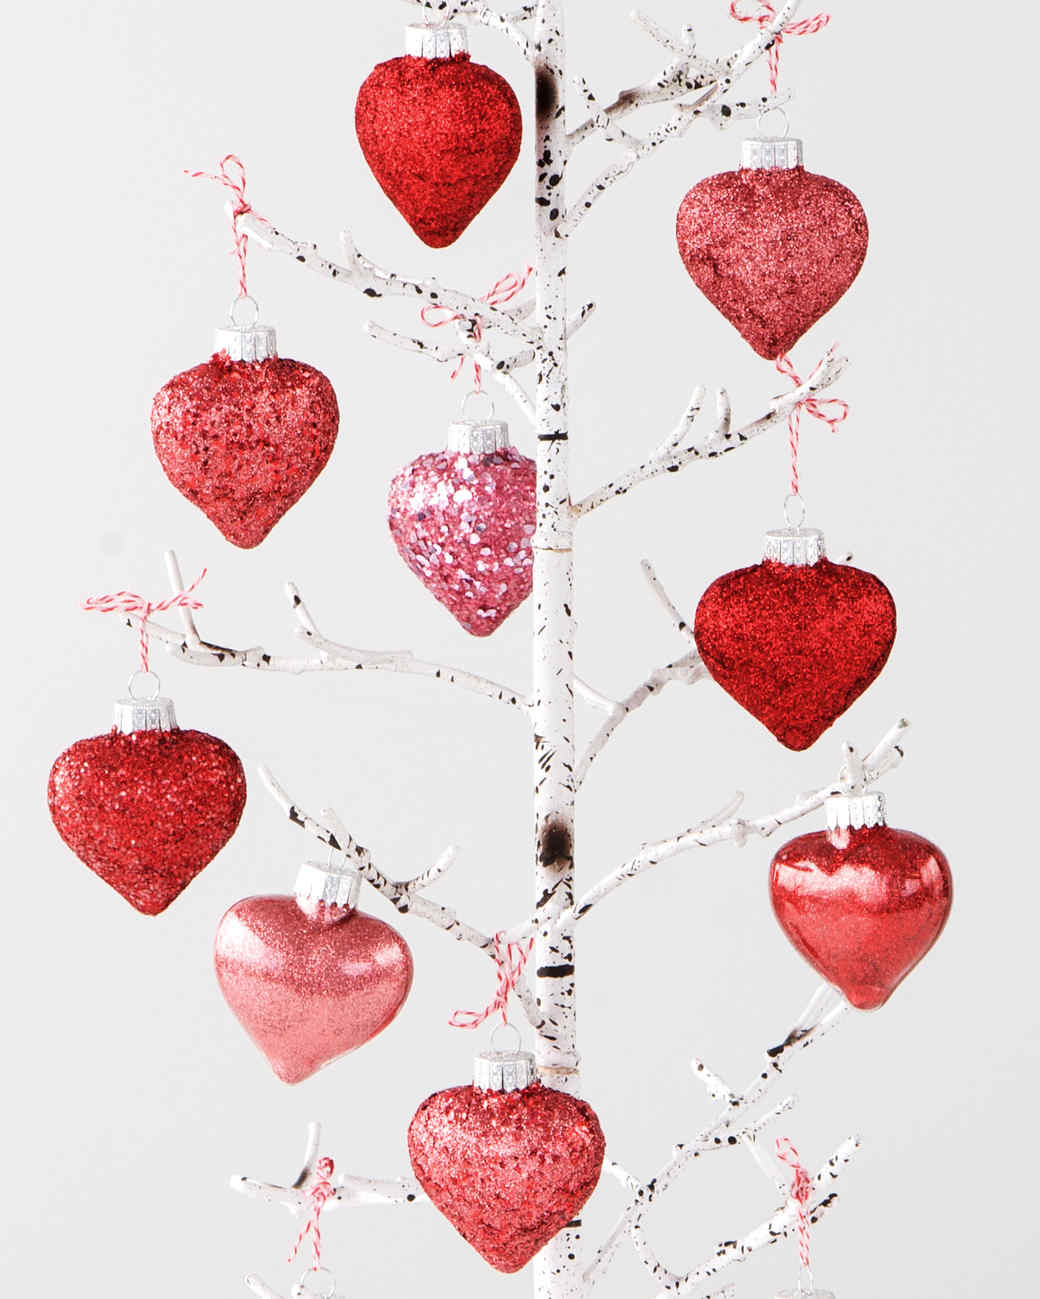 14-days-valentines-0394-d110966r.jpg